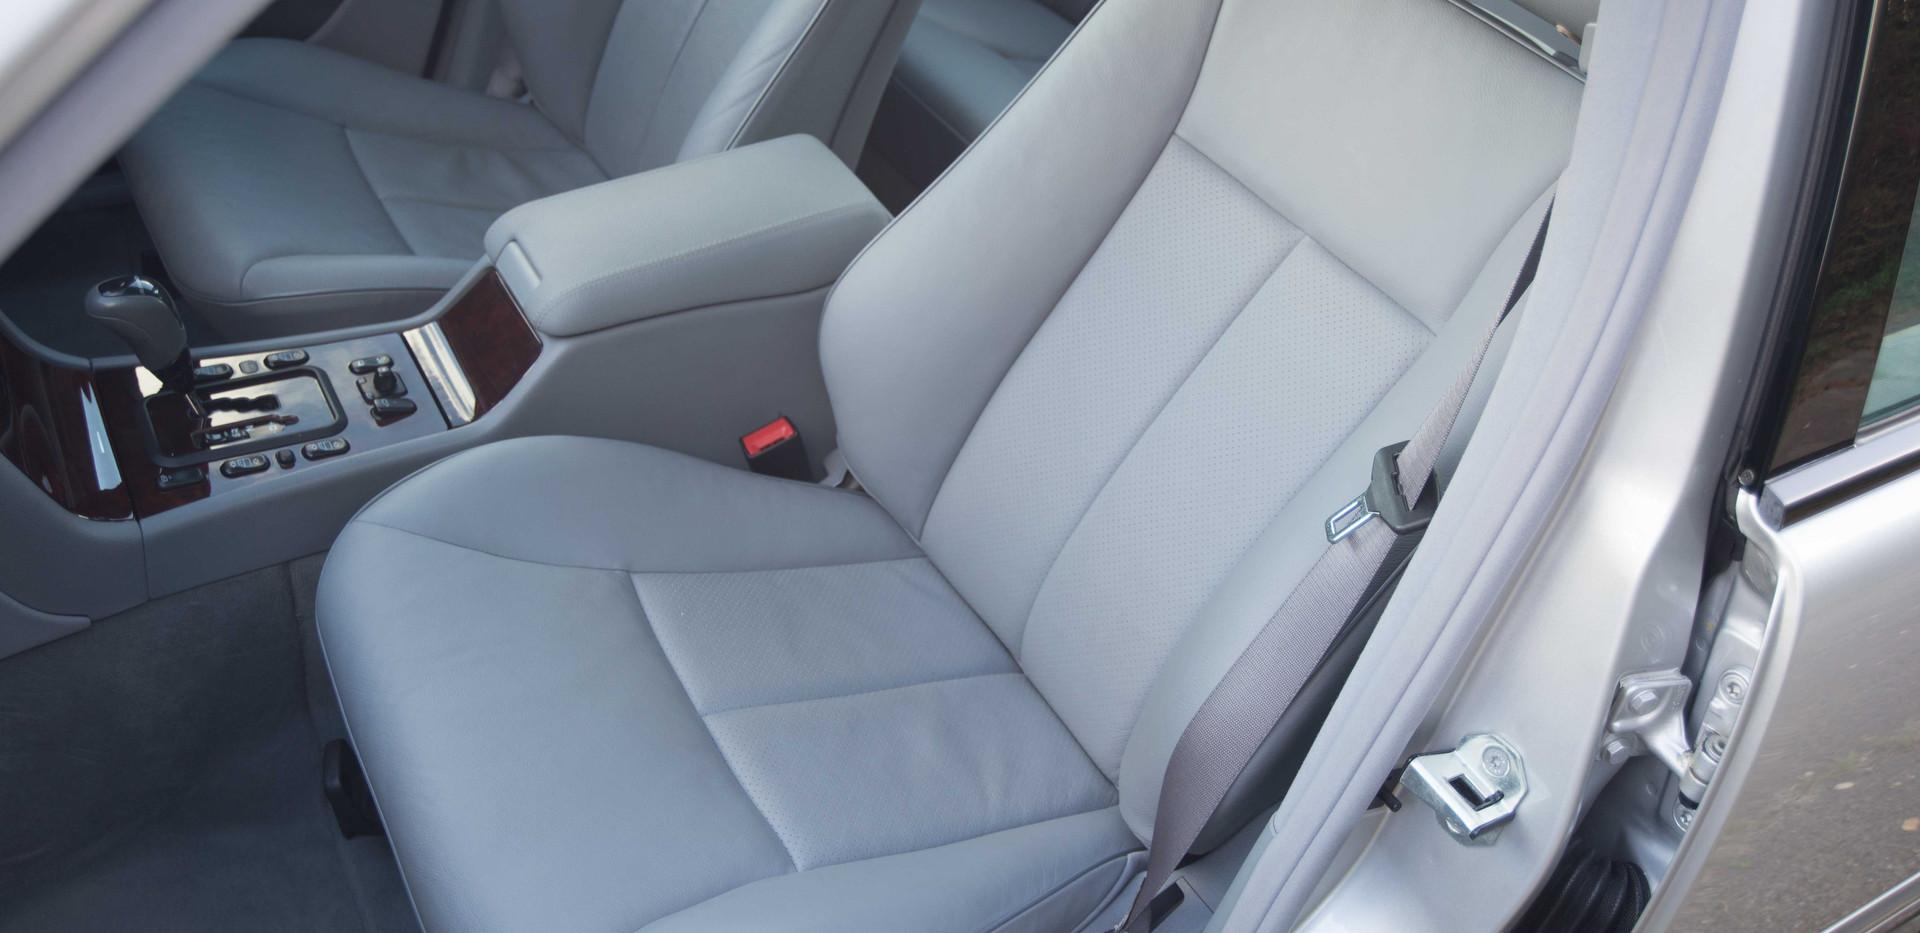 Mercedes E240 For Sale UK London  (66 of